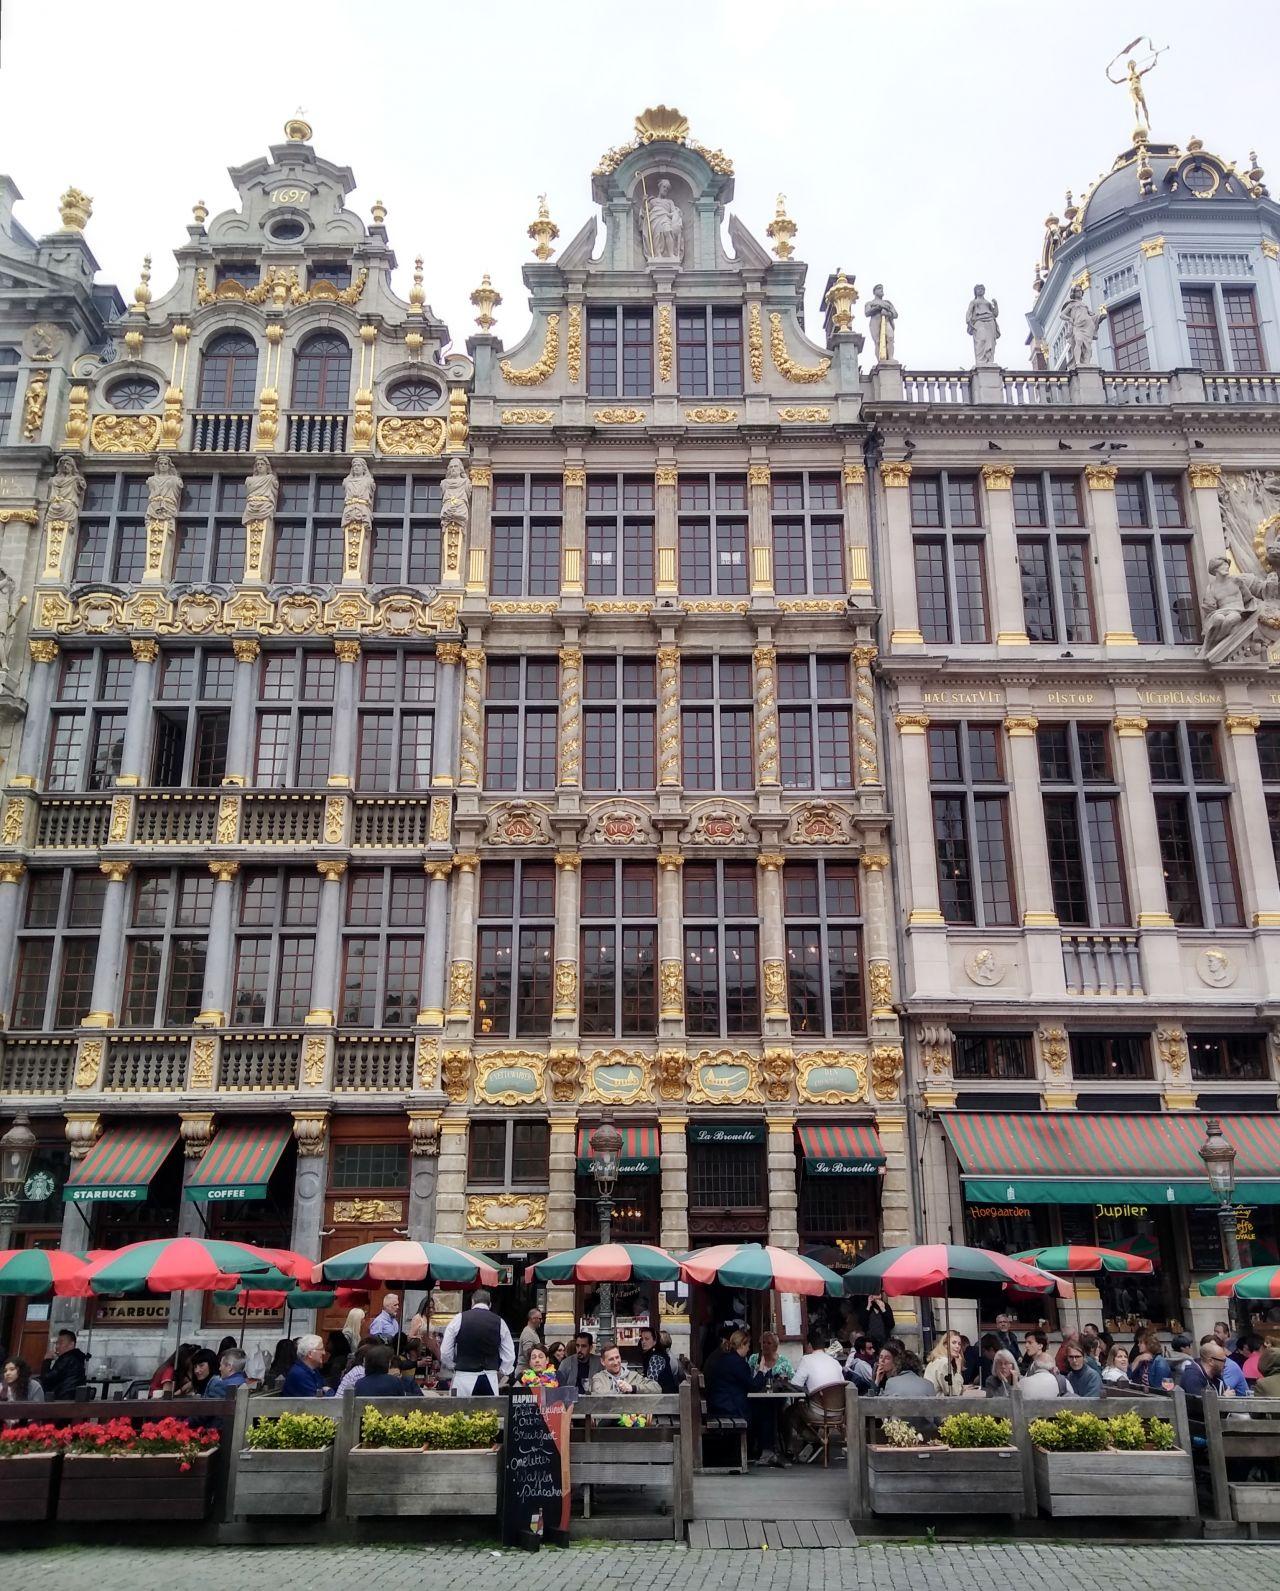 Brussel Grote Markt5